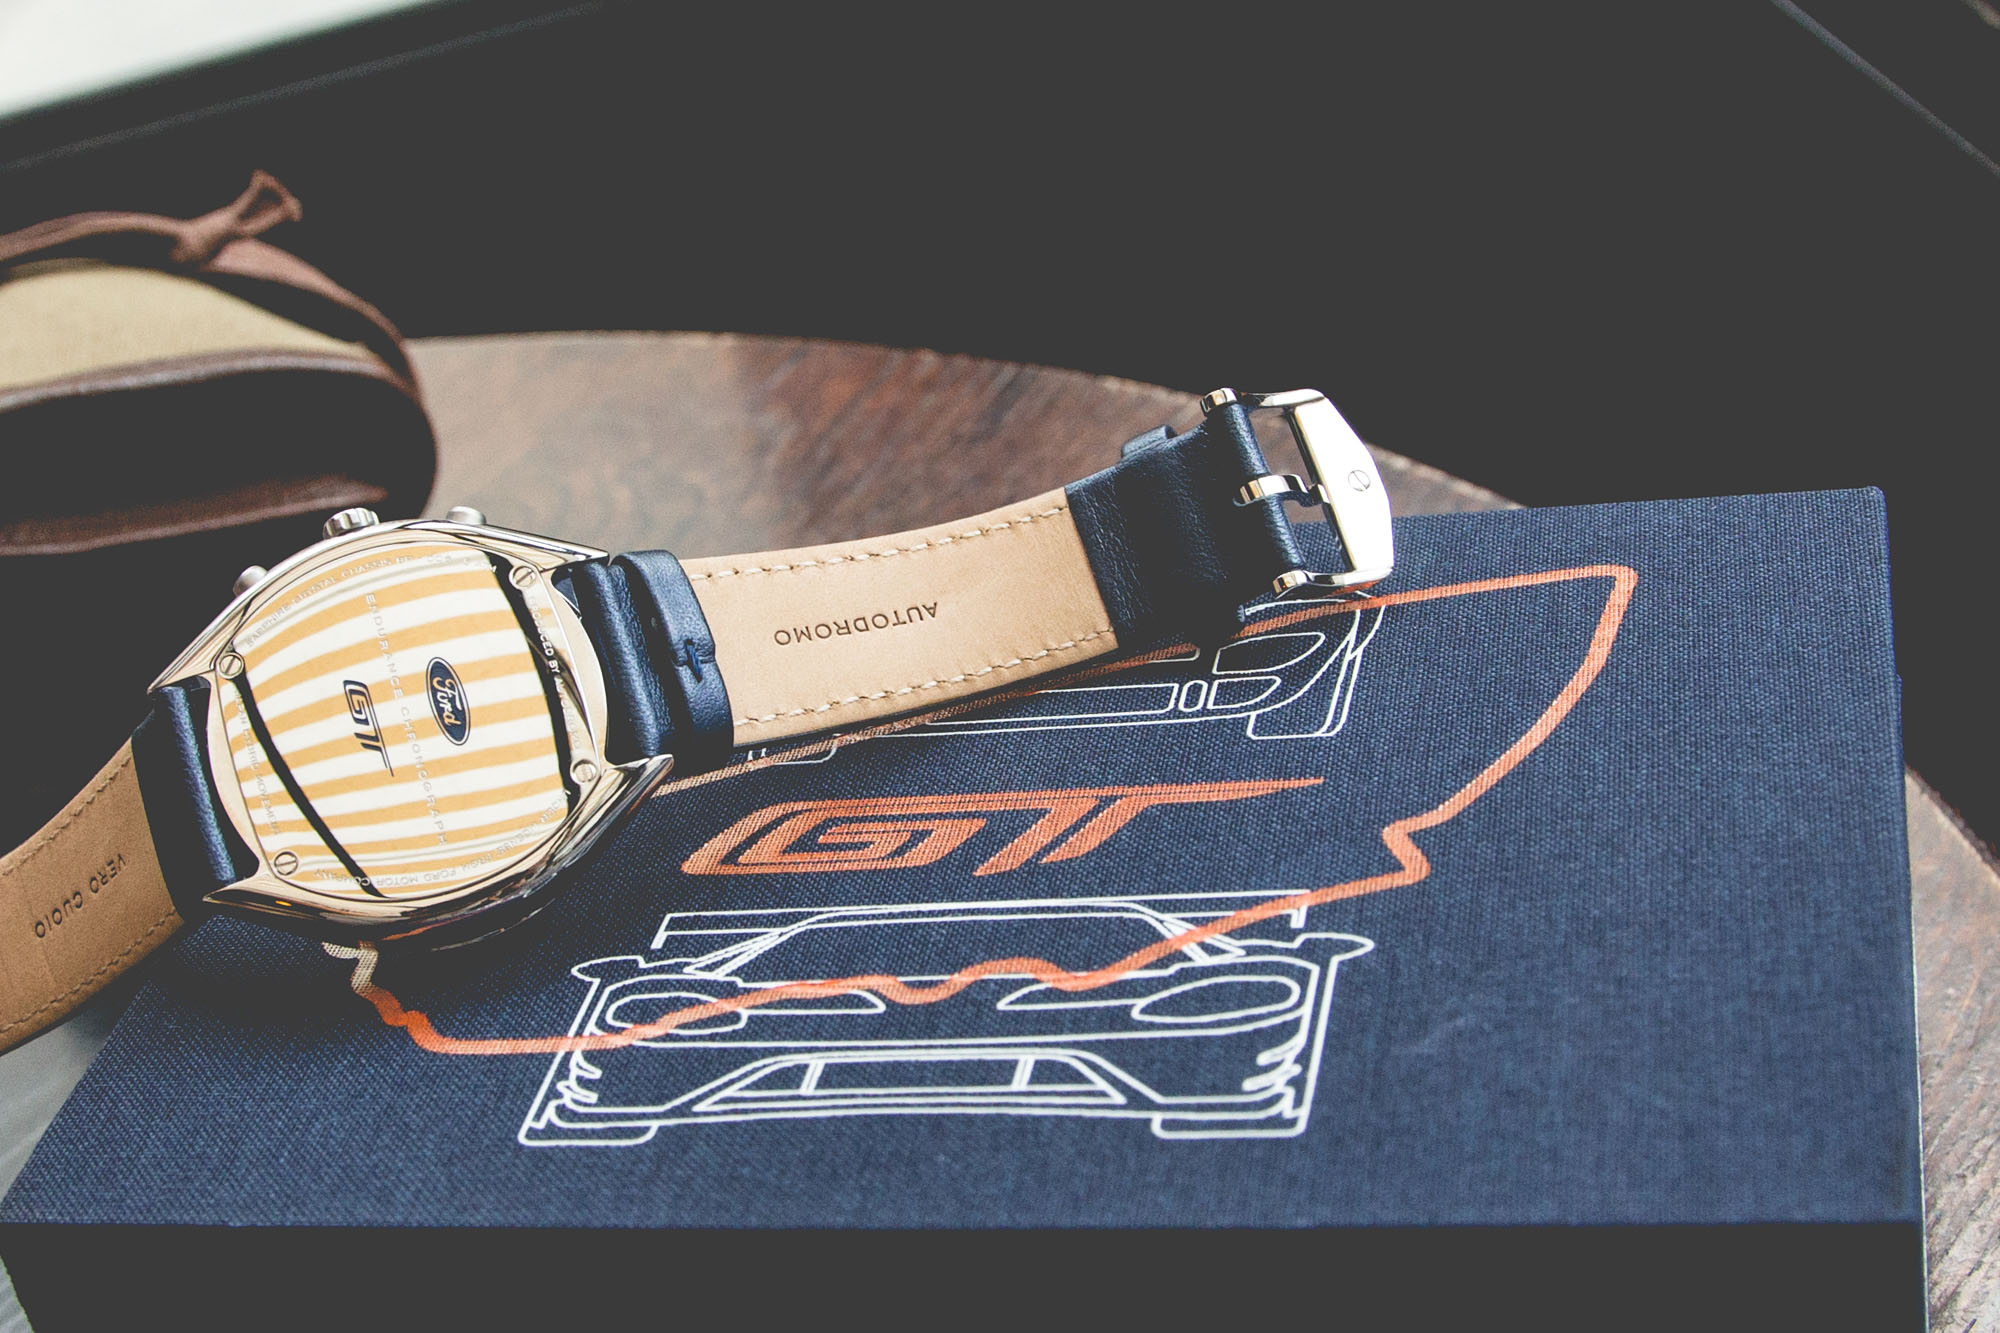 Autodromo GT Endurance Chronograph - Caseback